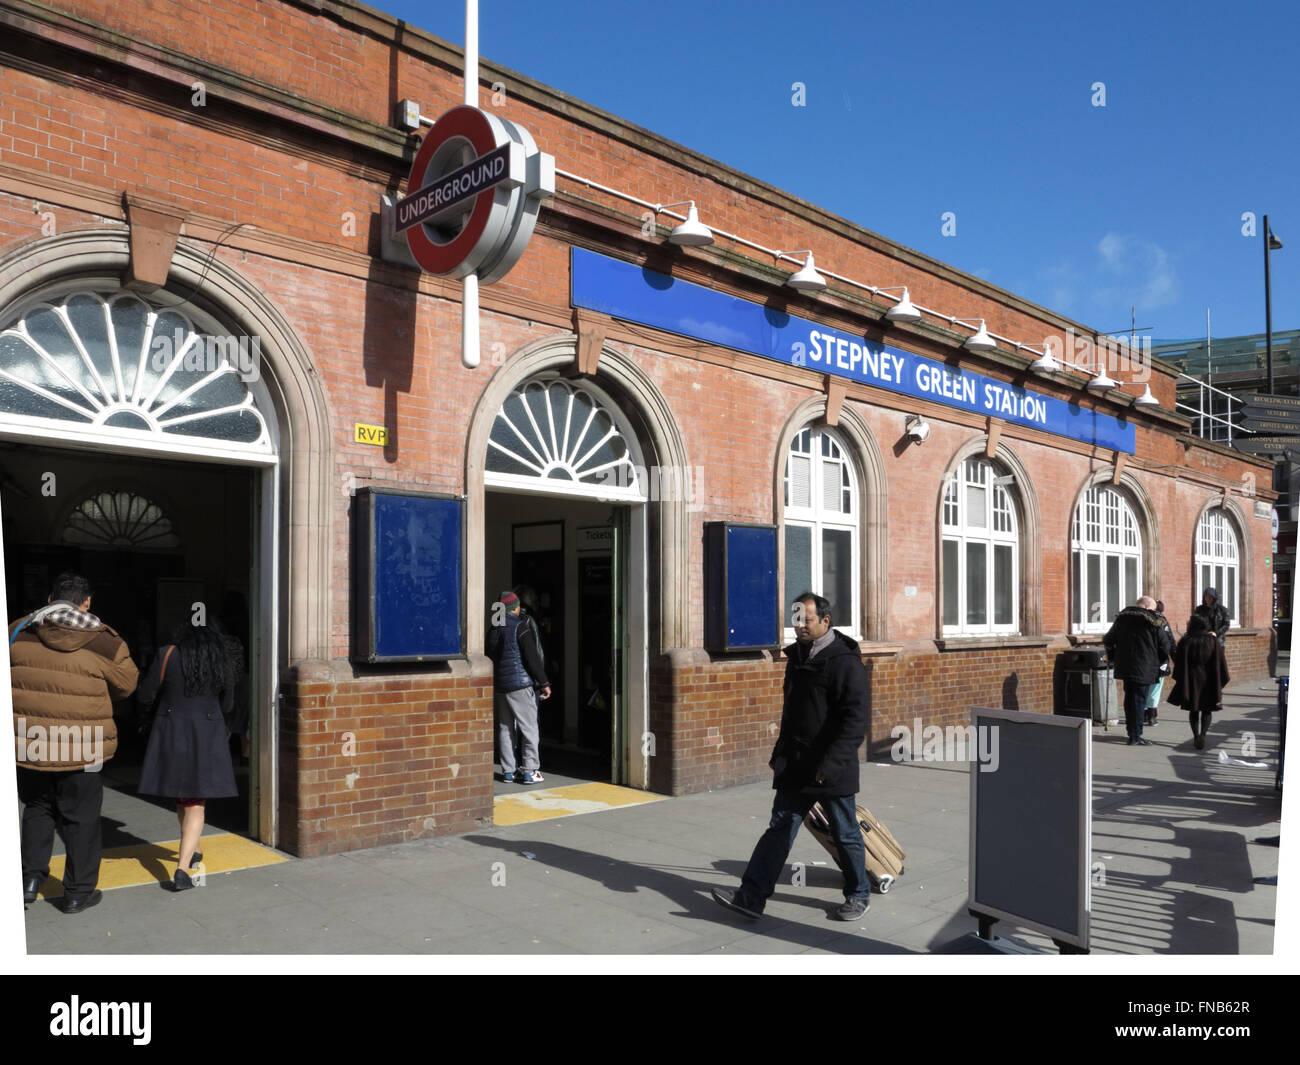 Stepney Green Underground Station - Stock Image